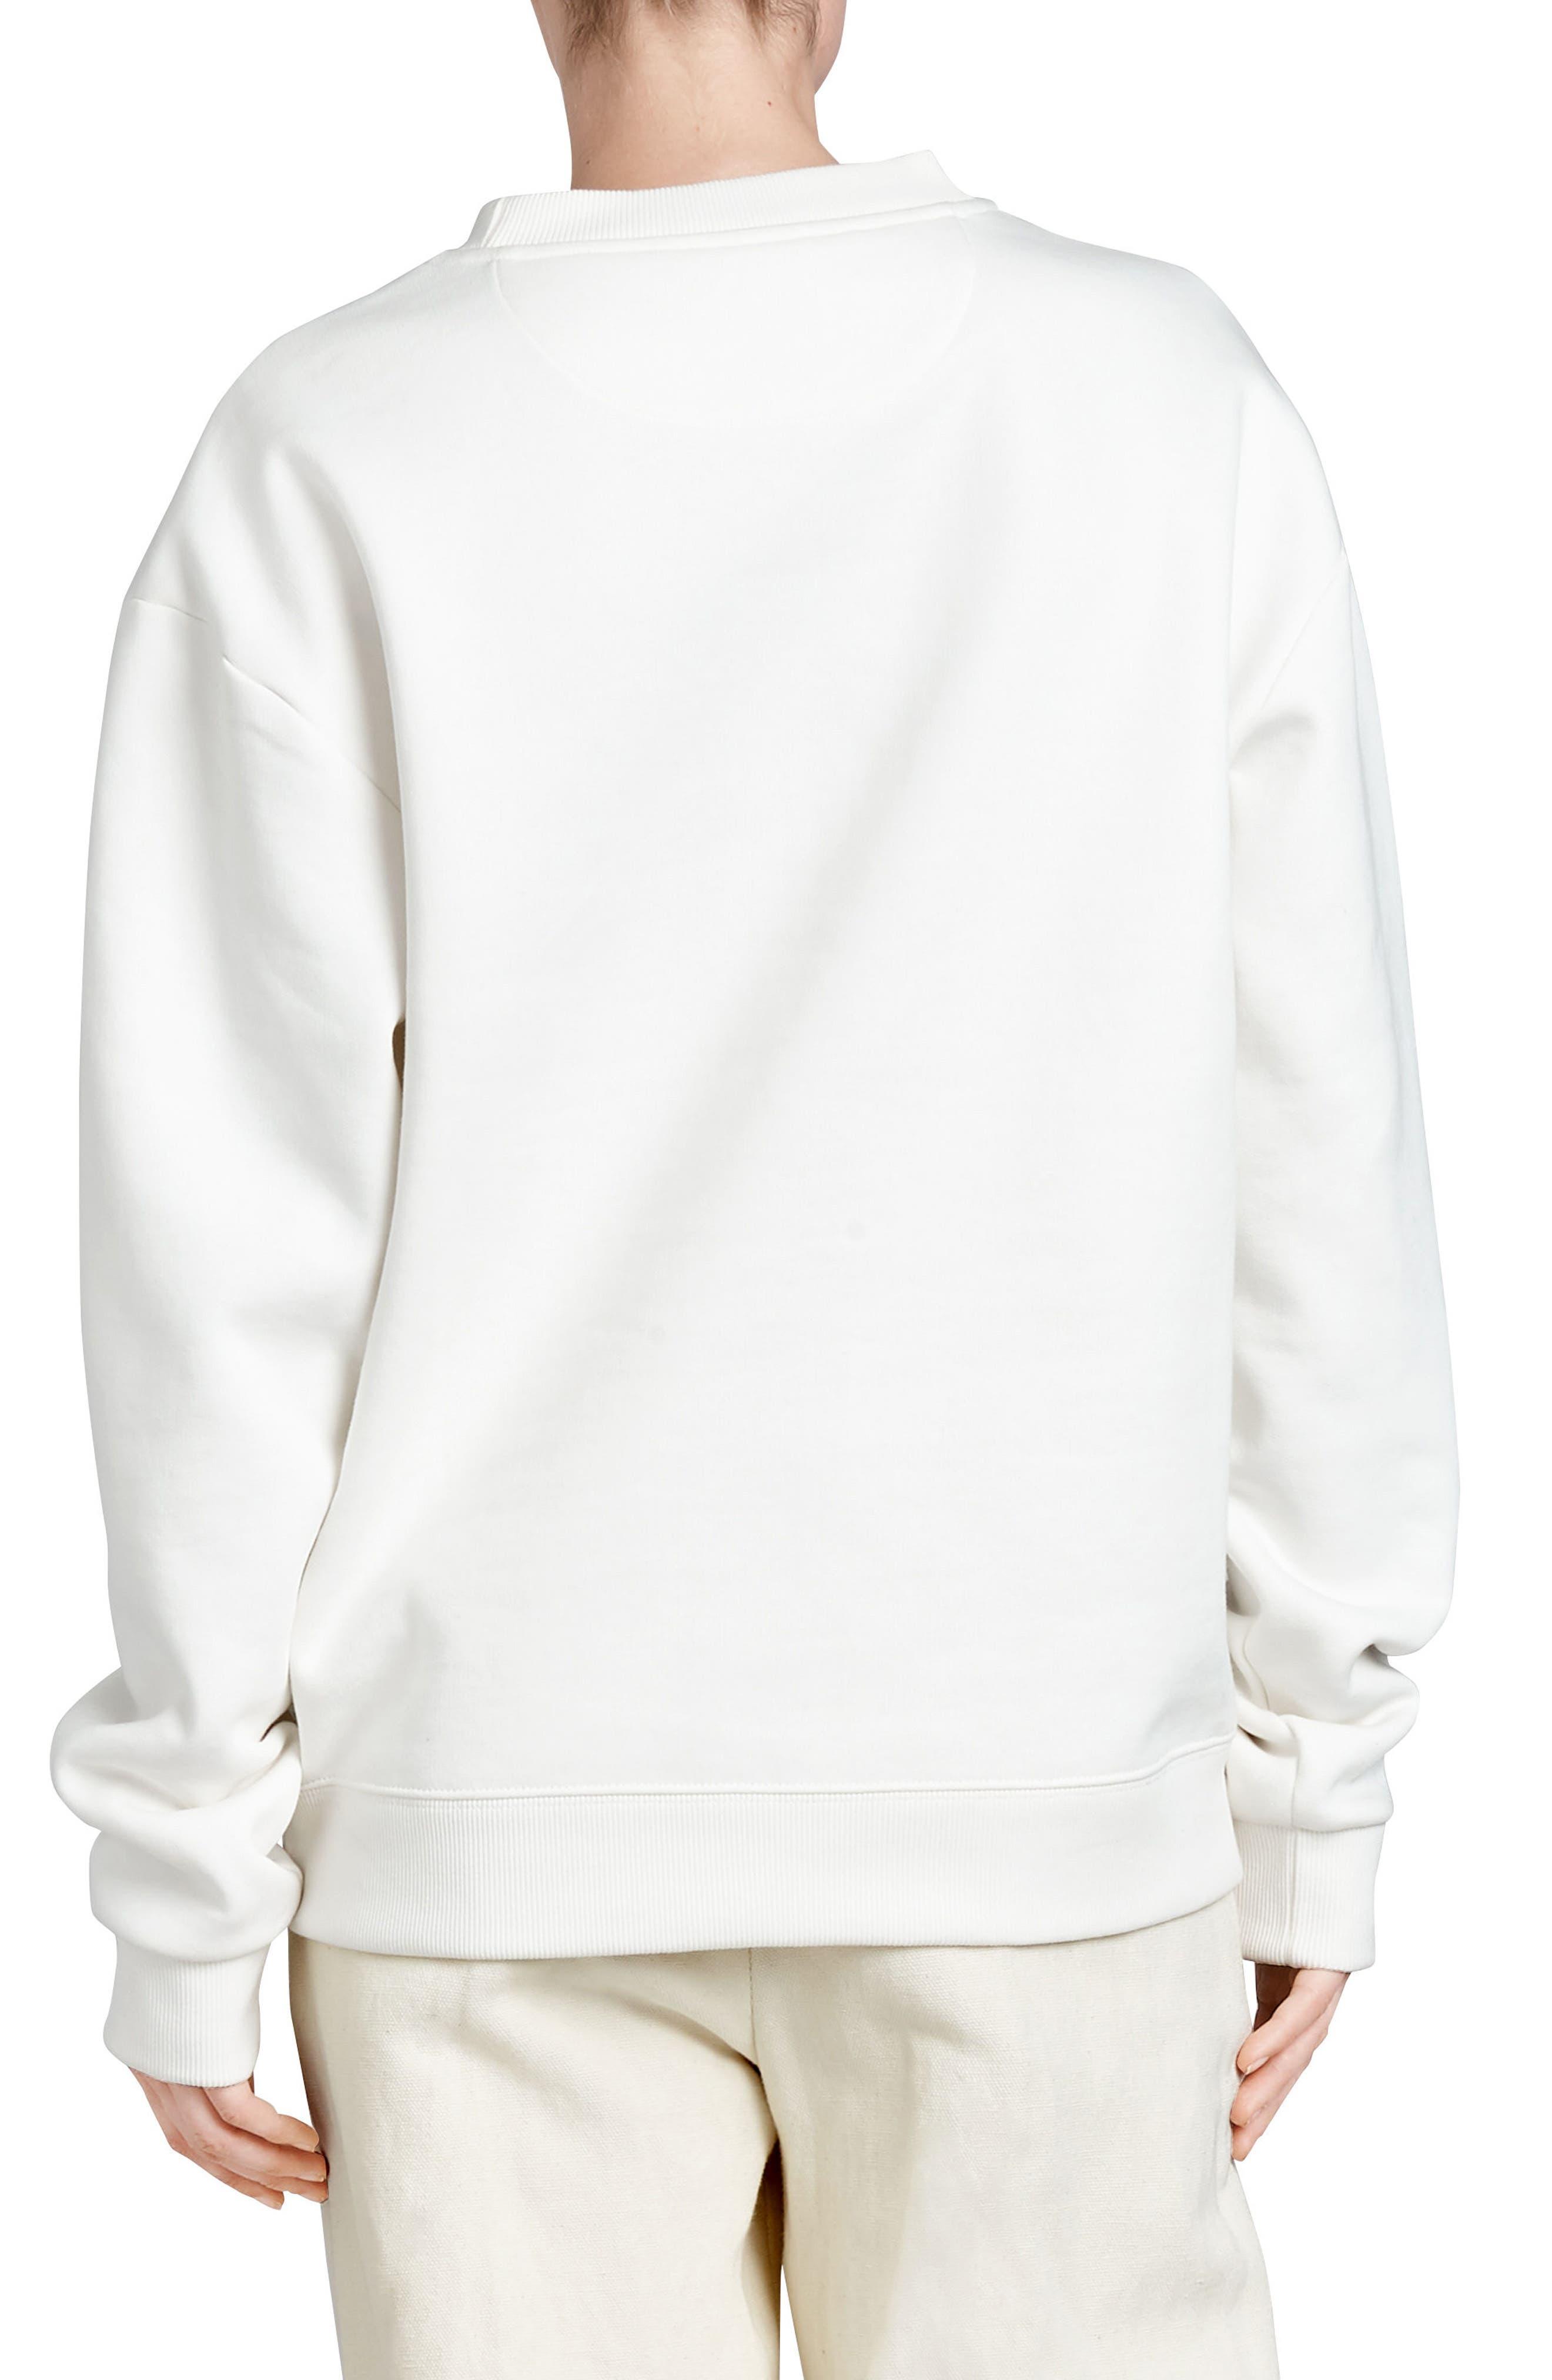 Vintage Crest Sweatshirt,                             Alternate thumbnail 2, color,                             904